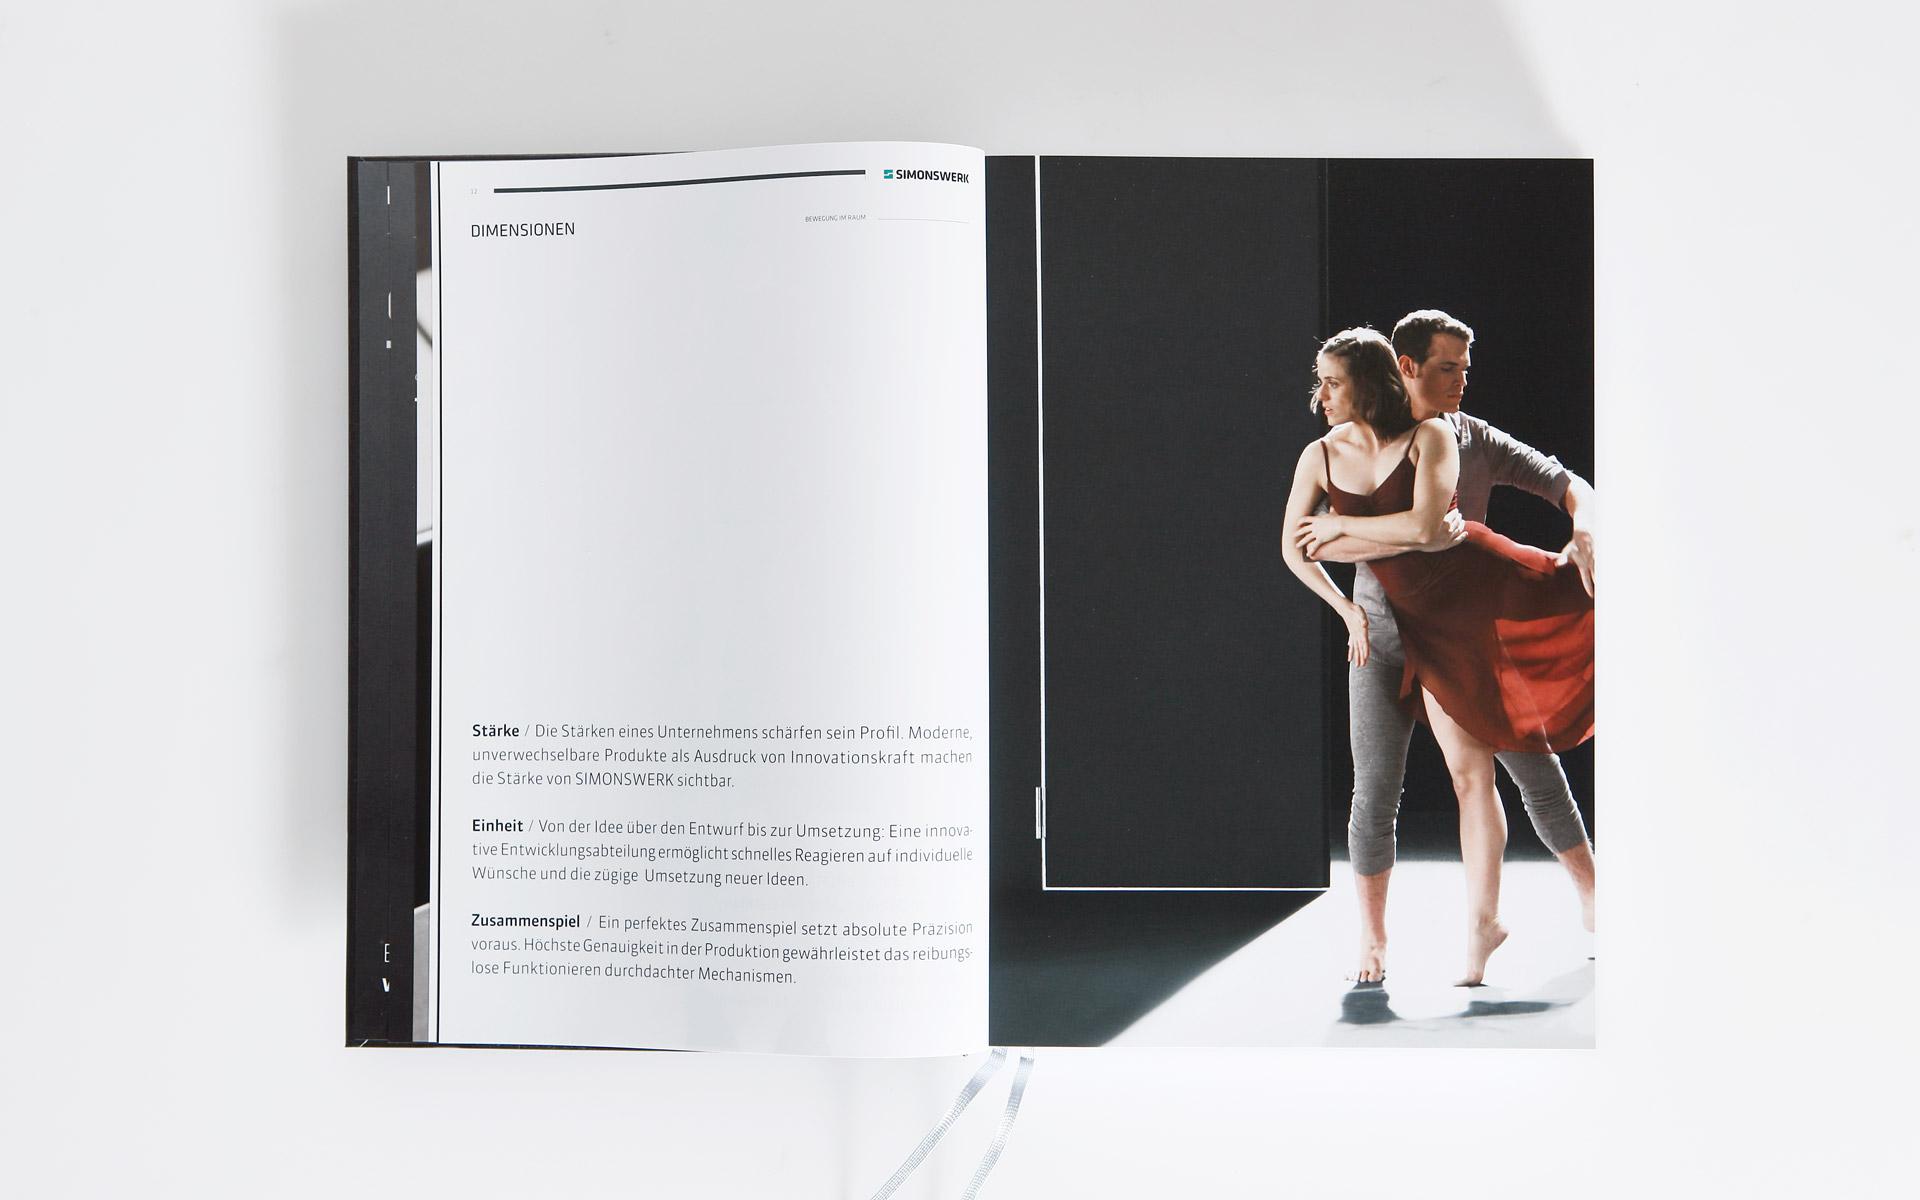 Simonswerk Kompendium 2012, Handbuch, Doppelseite, Image